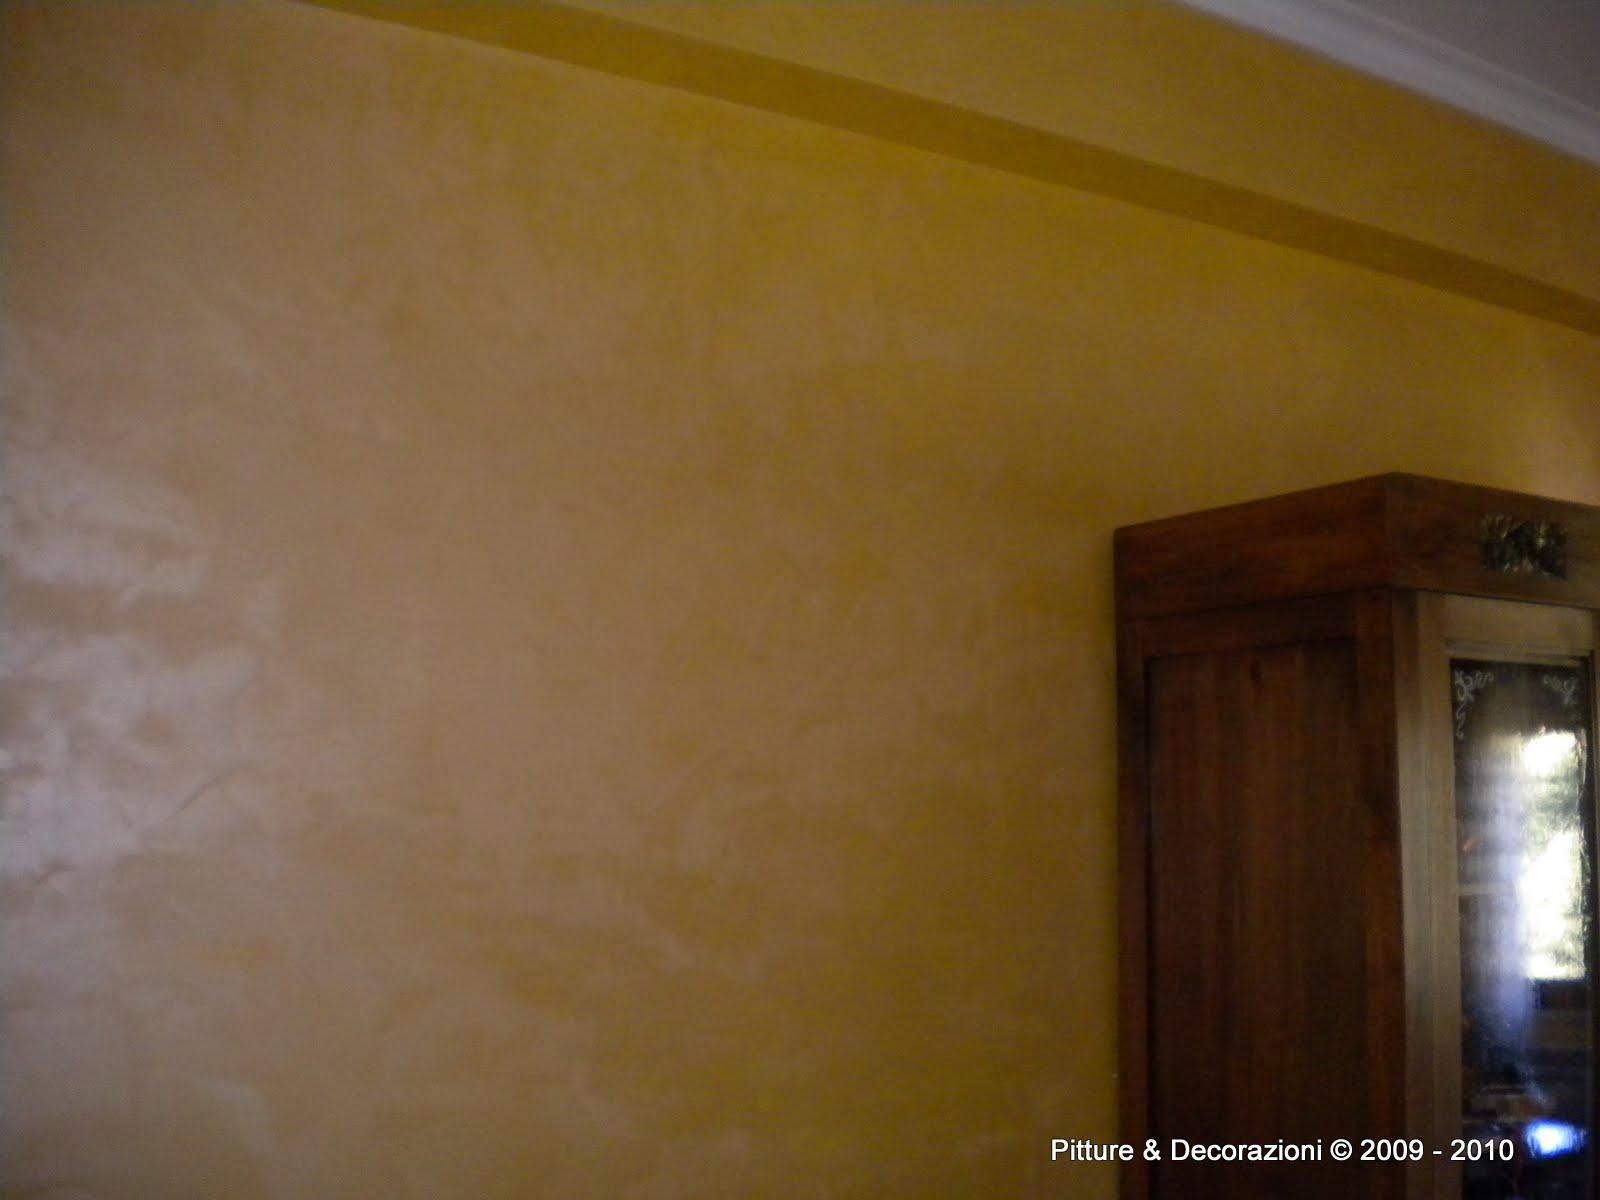 Pittura Pareti Effetto Seta : Pitturare pareti interne affordable idee per dipingere casa idee